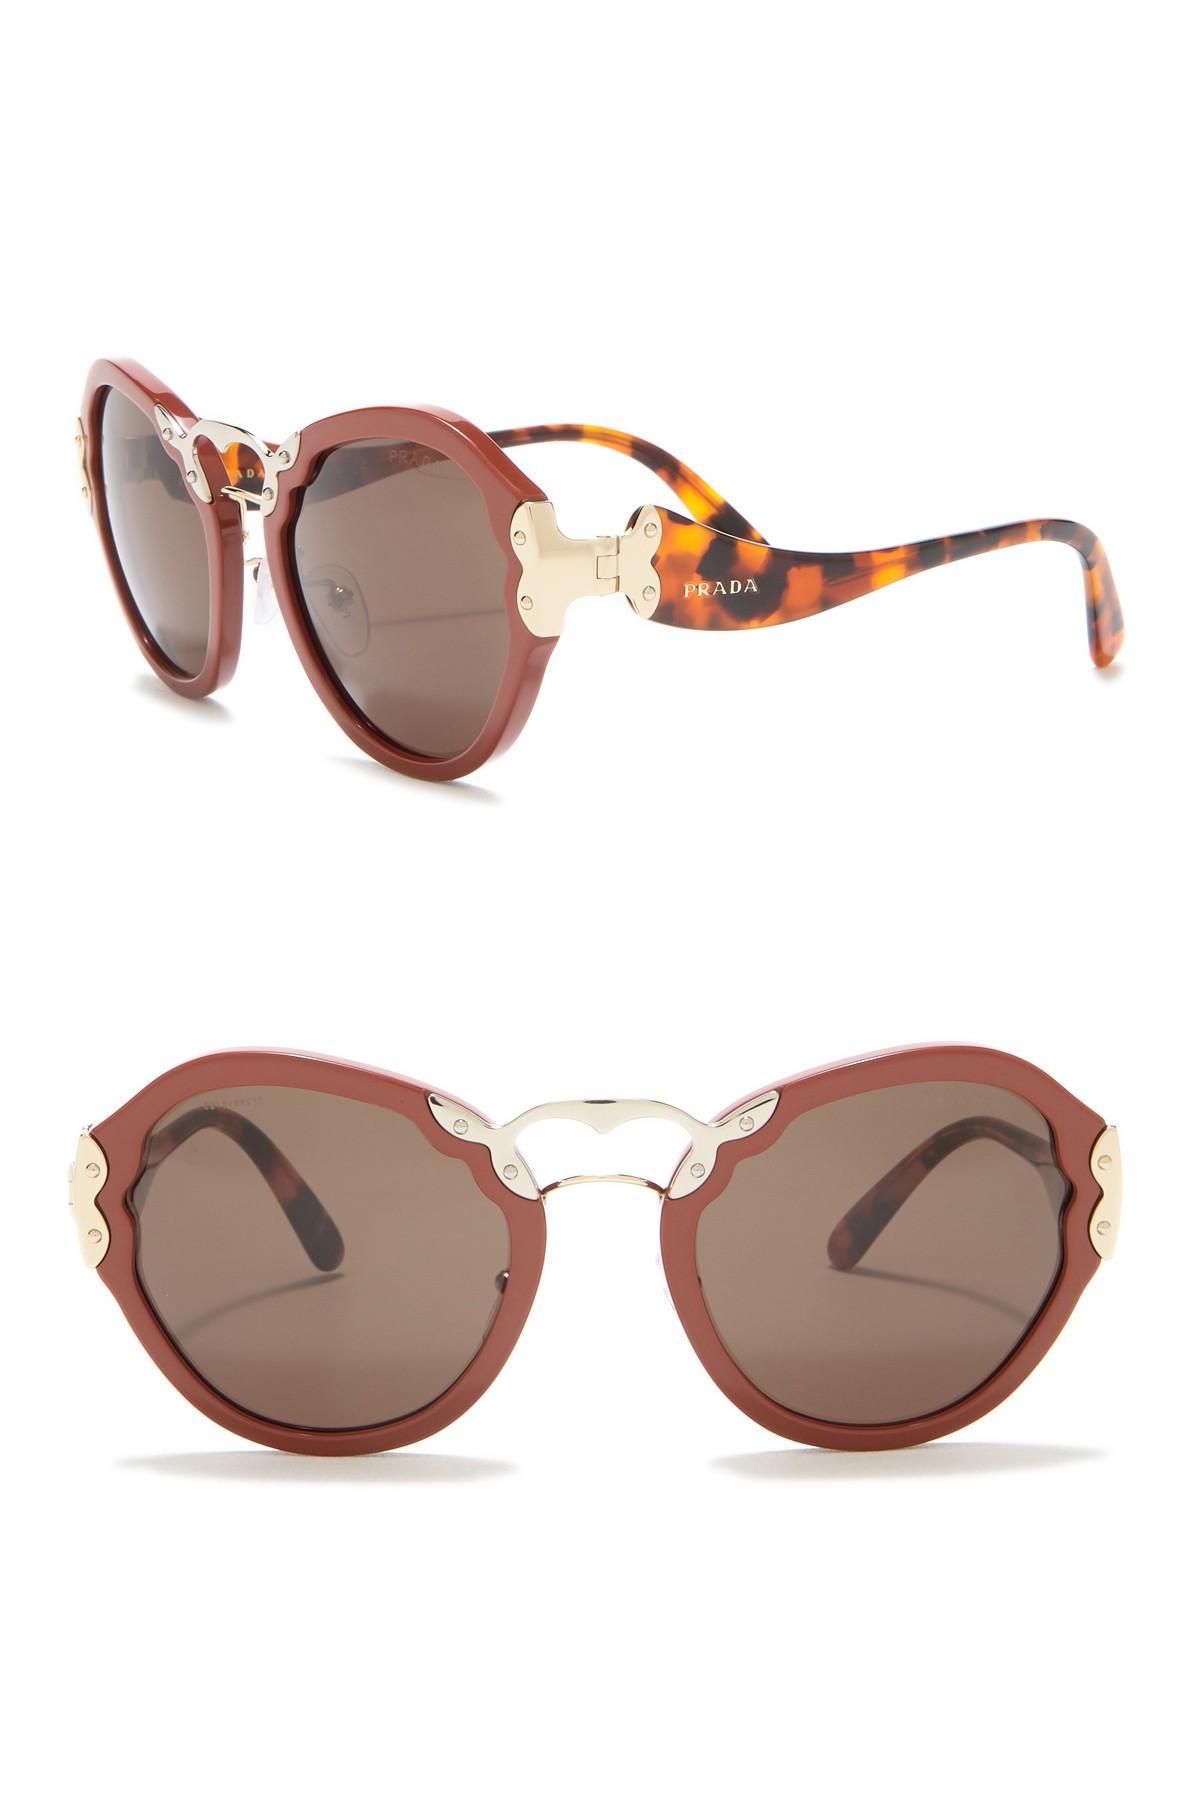 854a8f4a8cb Prada - Orange Irregular Catwalk 54mm Sunglasses - Lyst. View fullscreen